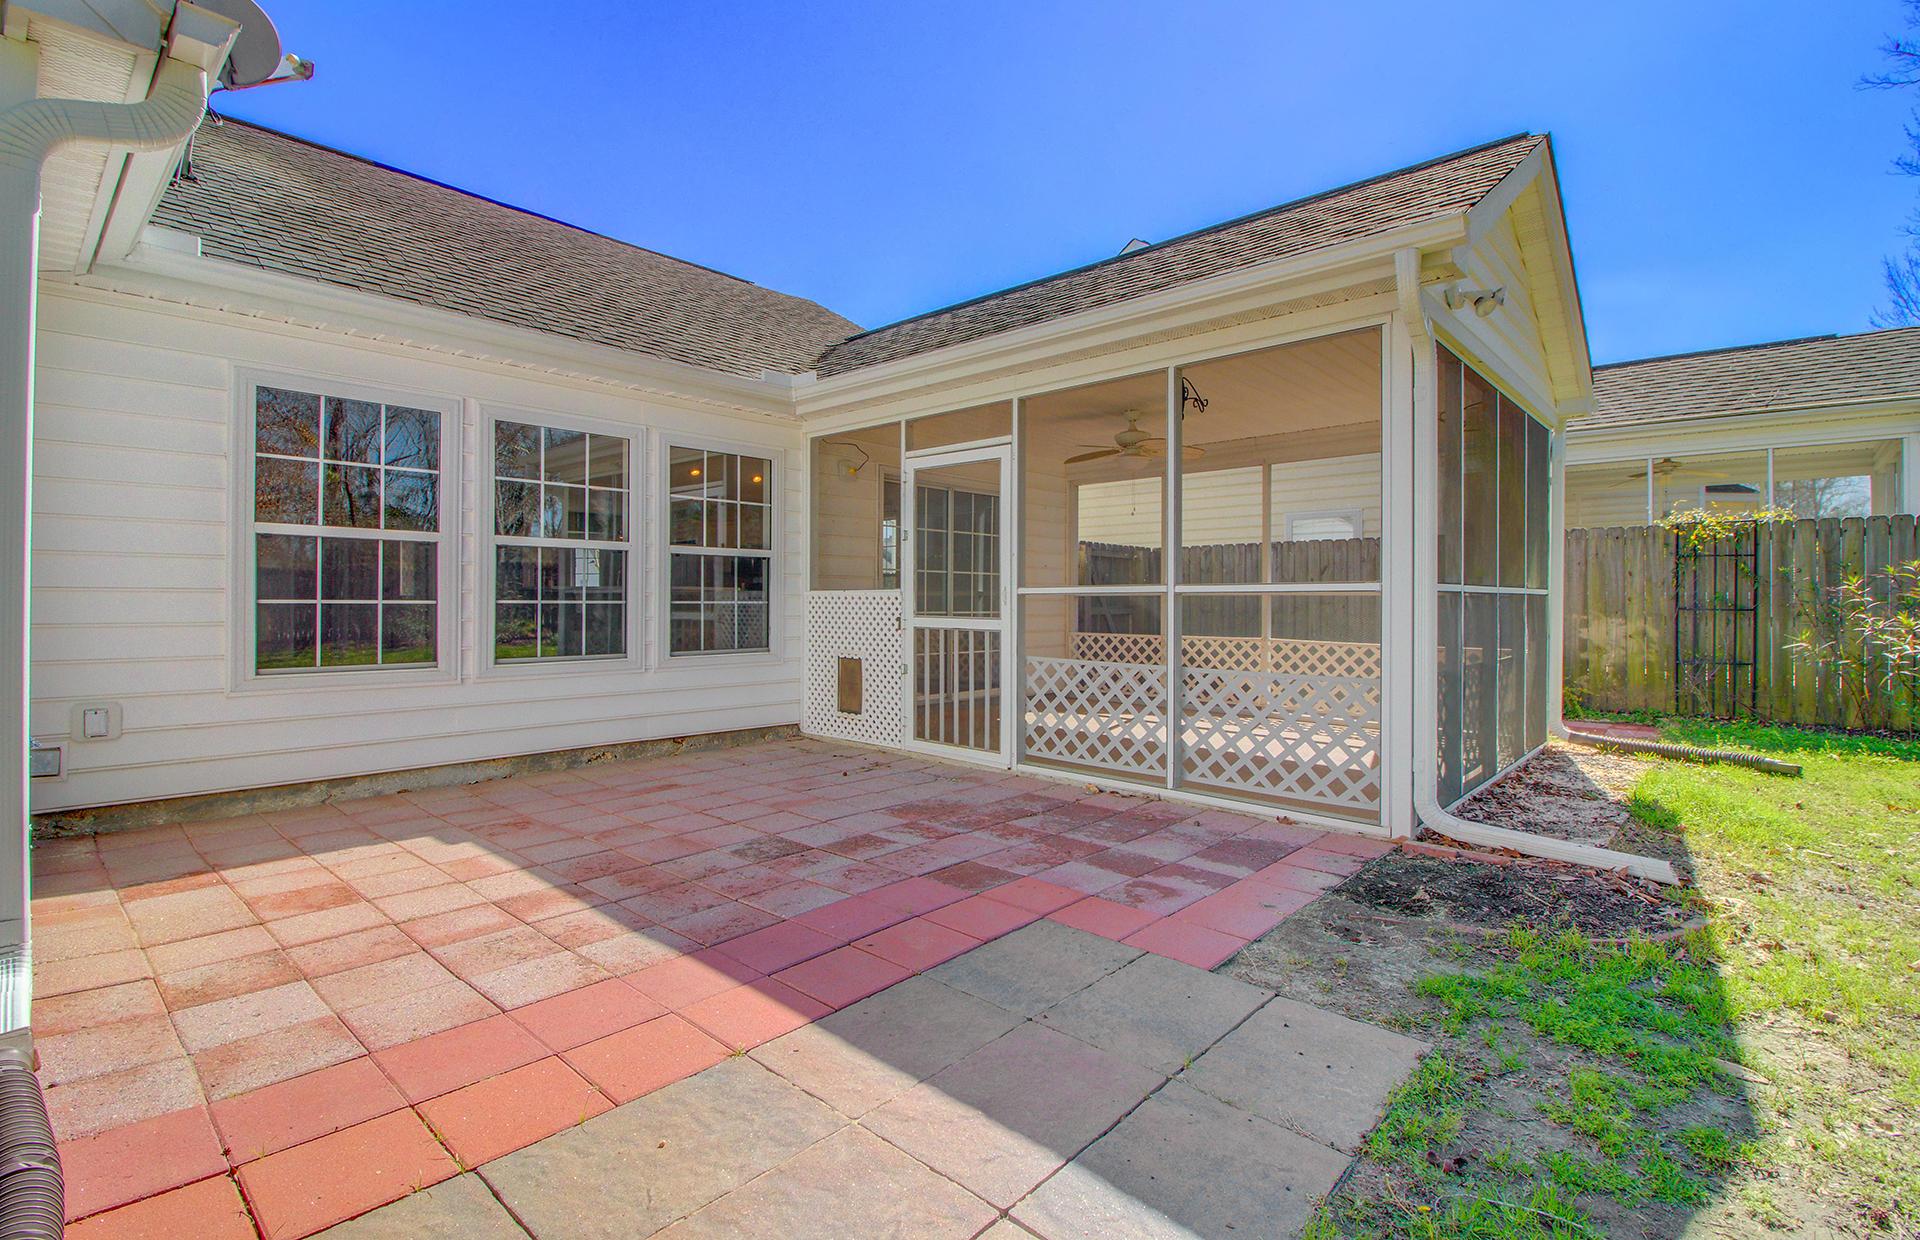 Grand Oaks Plantation Homes For Sale - 789 Bent Hickory, Charleston, SC - 26